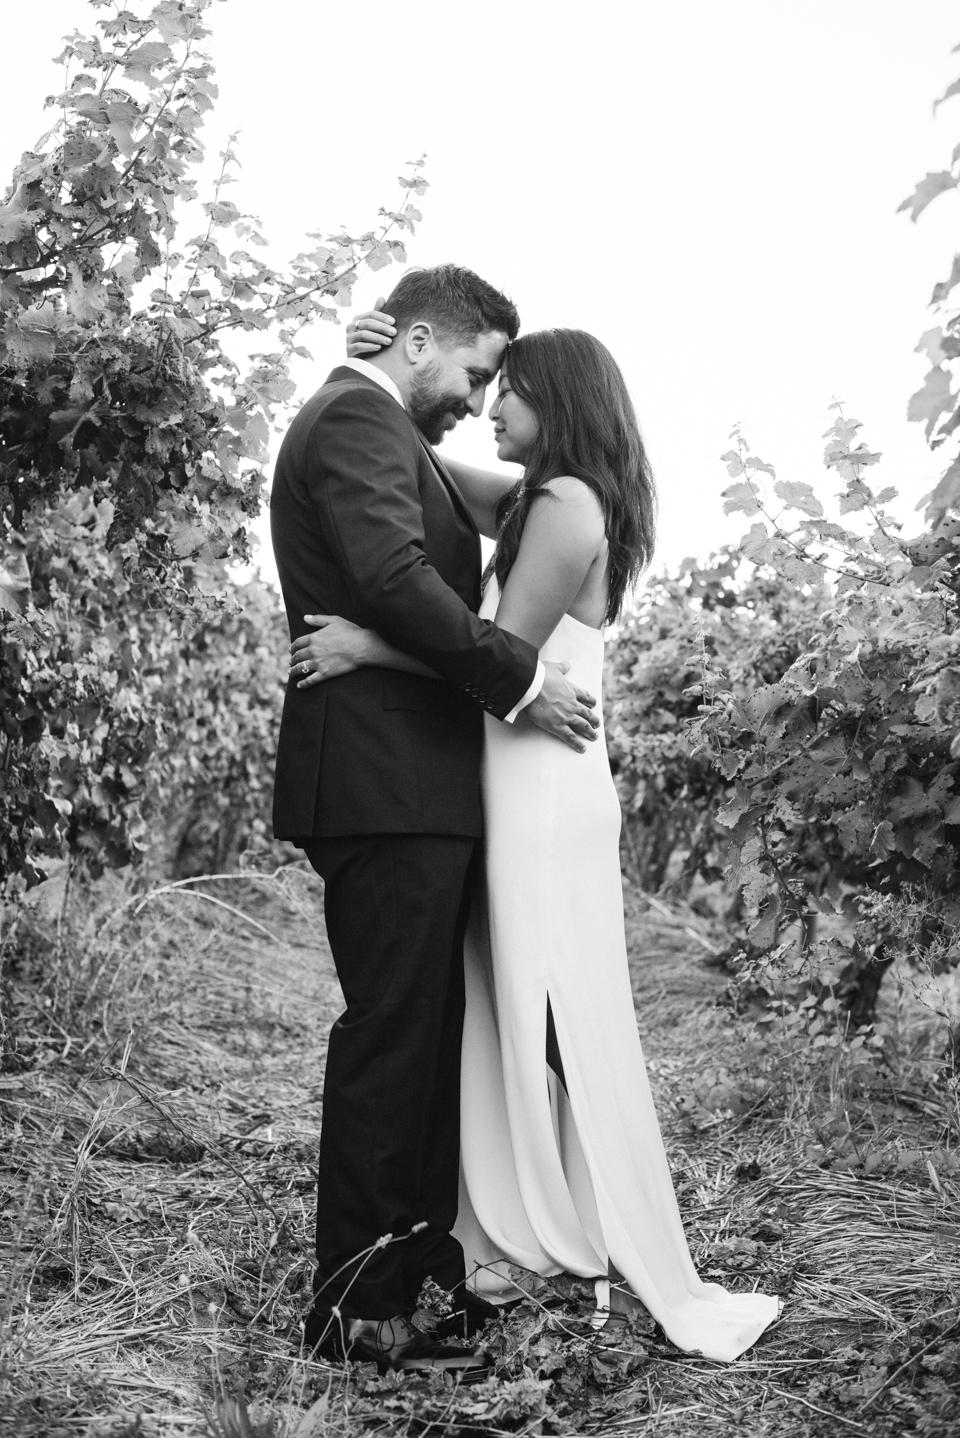 Grace and Alfonso wedding Clouds Estate Stellenbosch South Africa shot by dna photographers 740.jpg